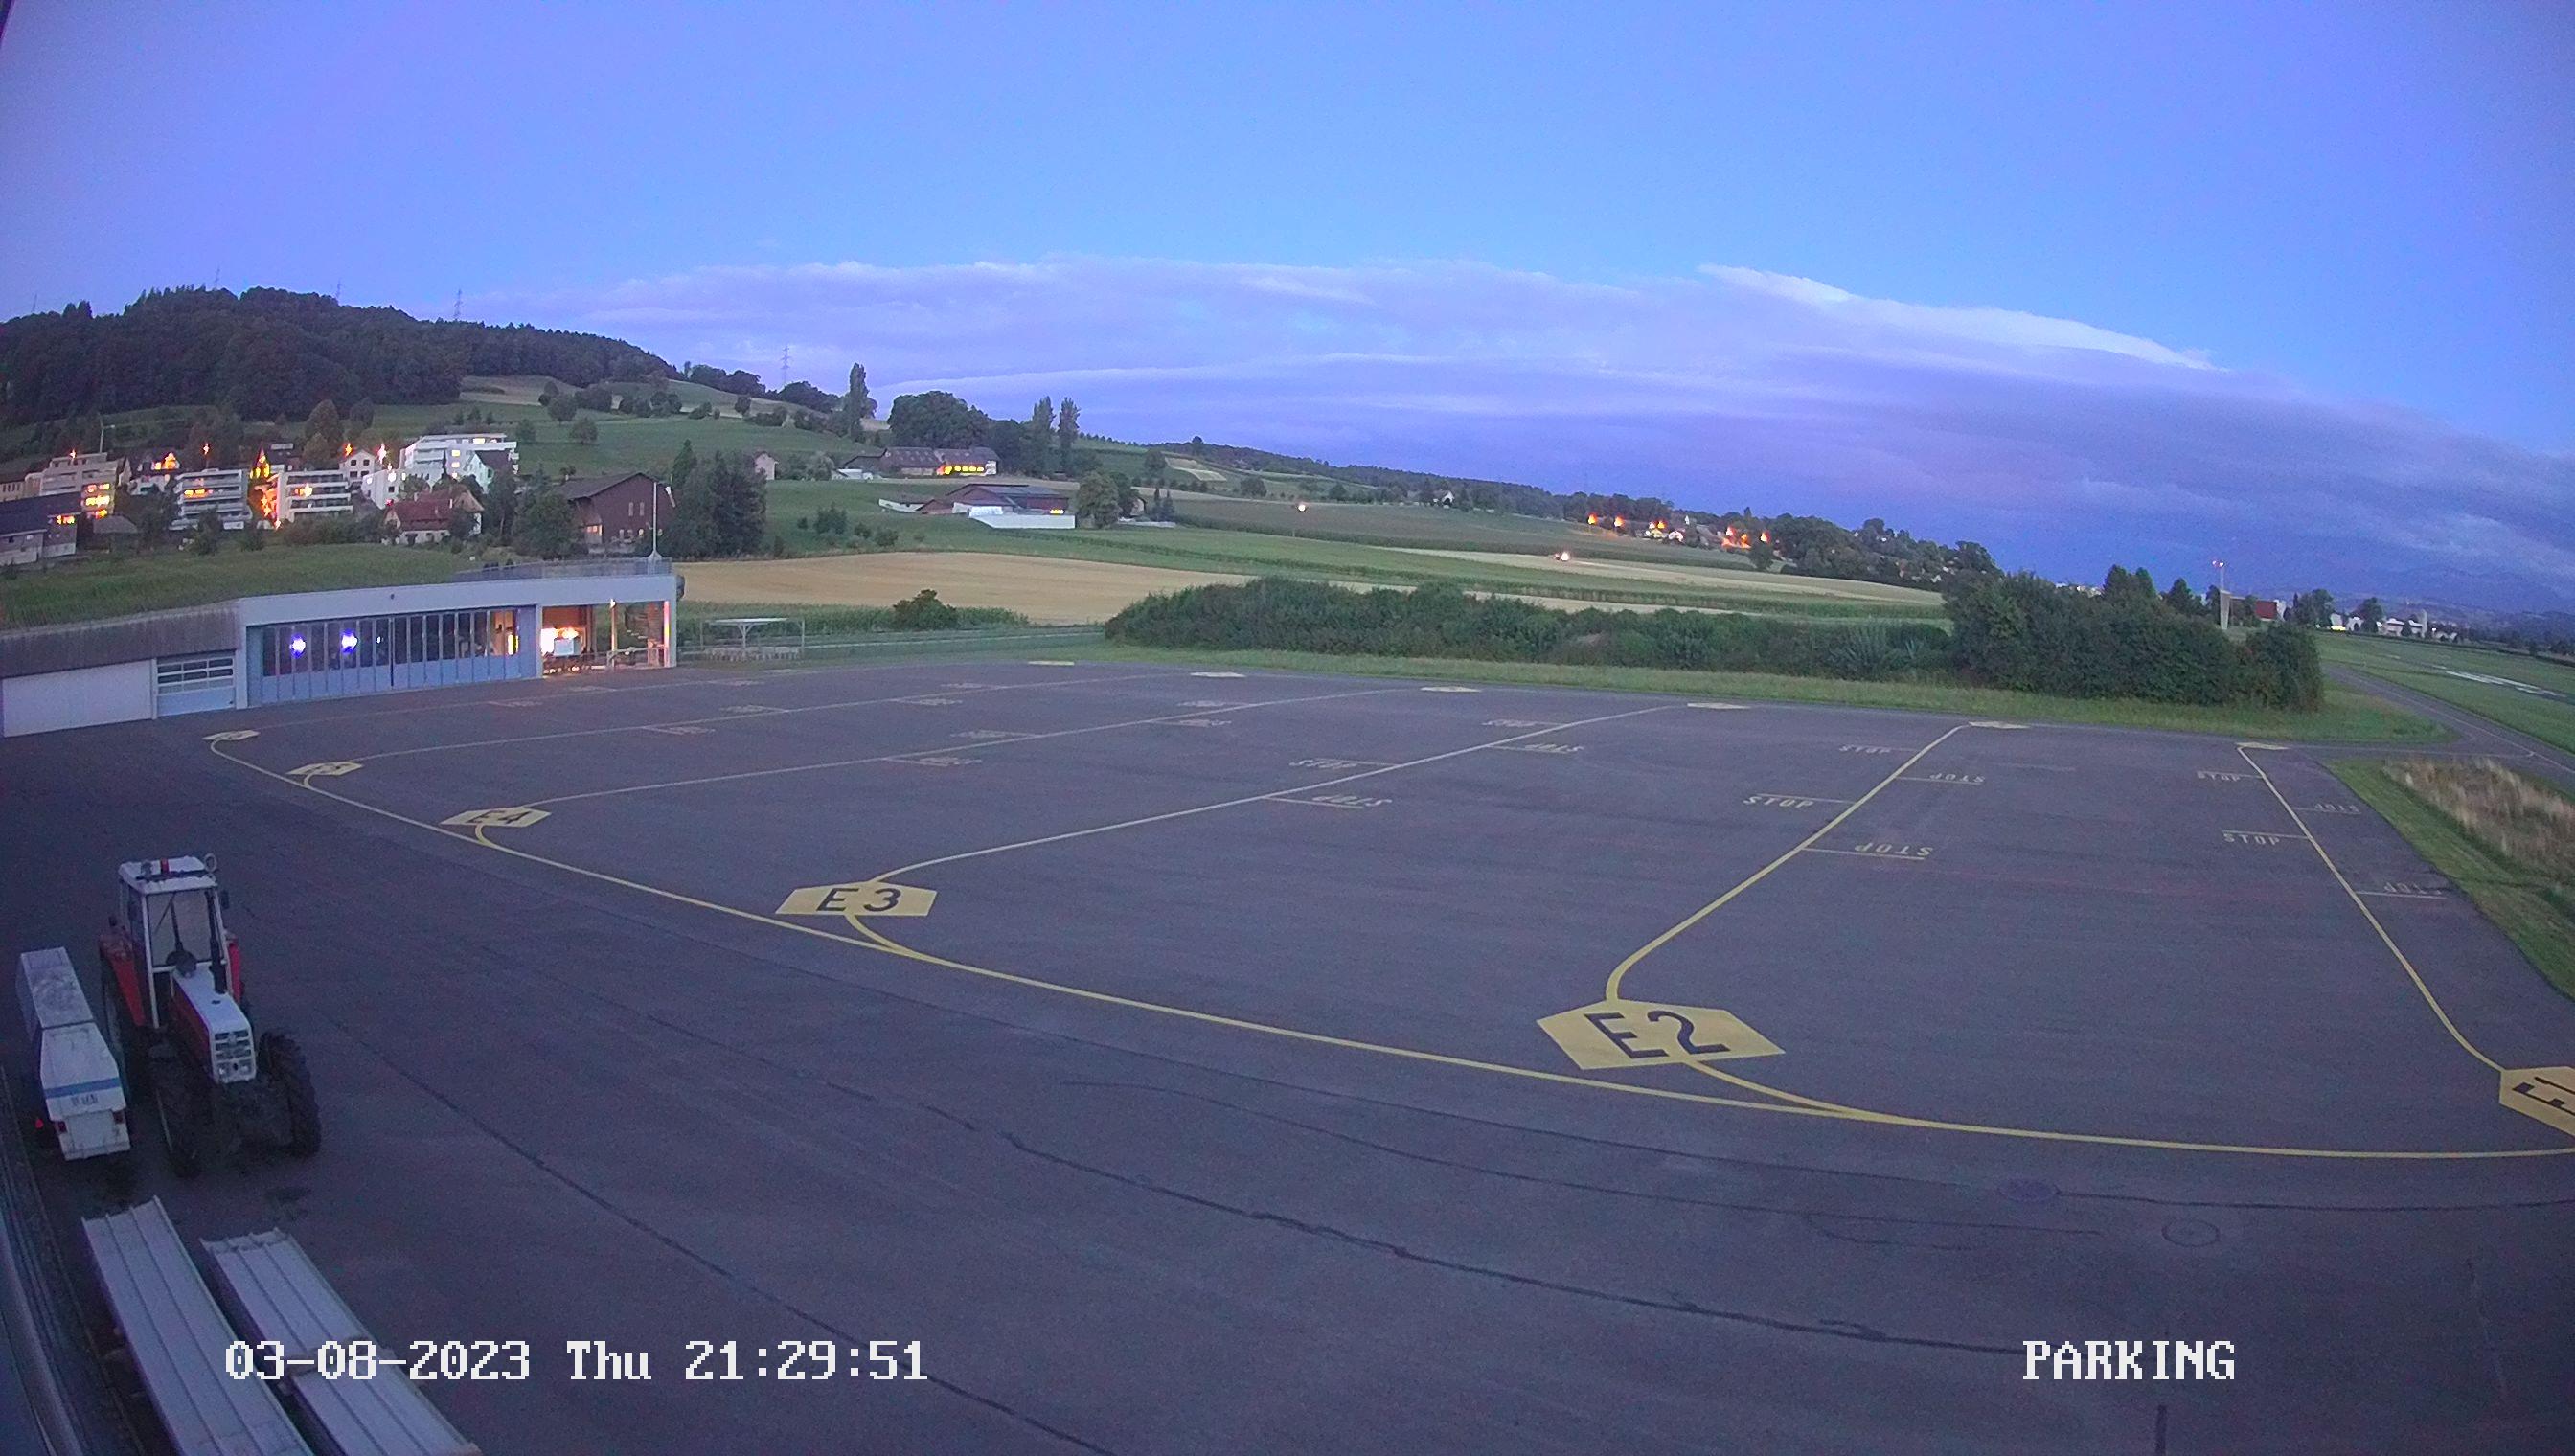 Triengen Flugplatz LSPN Süd-Os